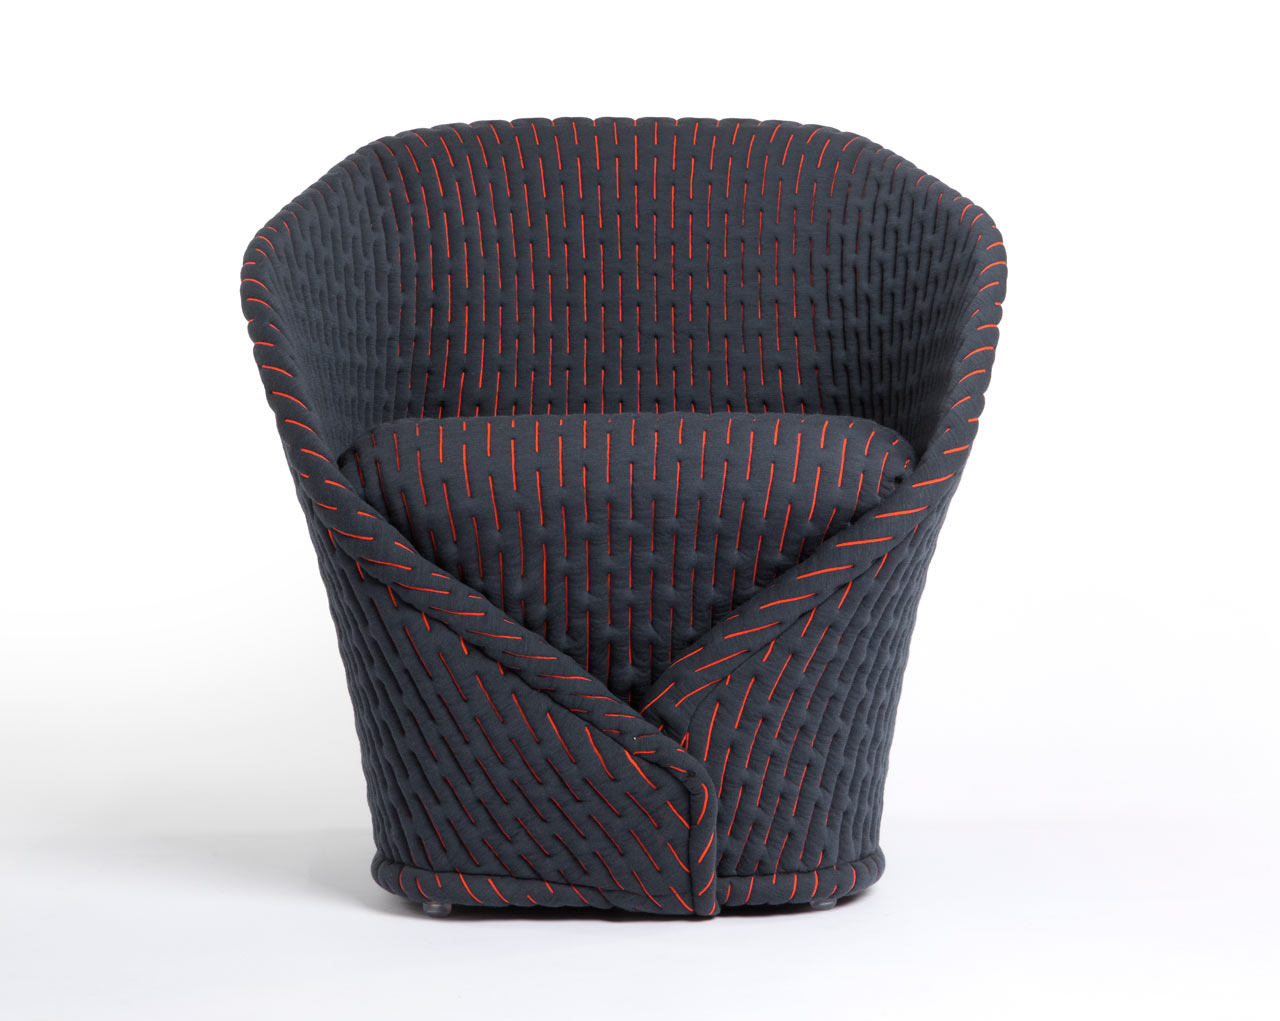 Talma Lounge Chair by Benjamin Hubert for Moroso